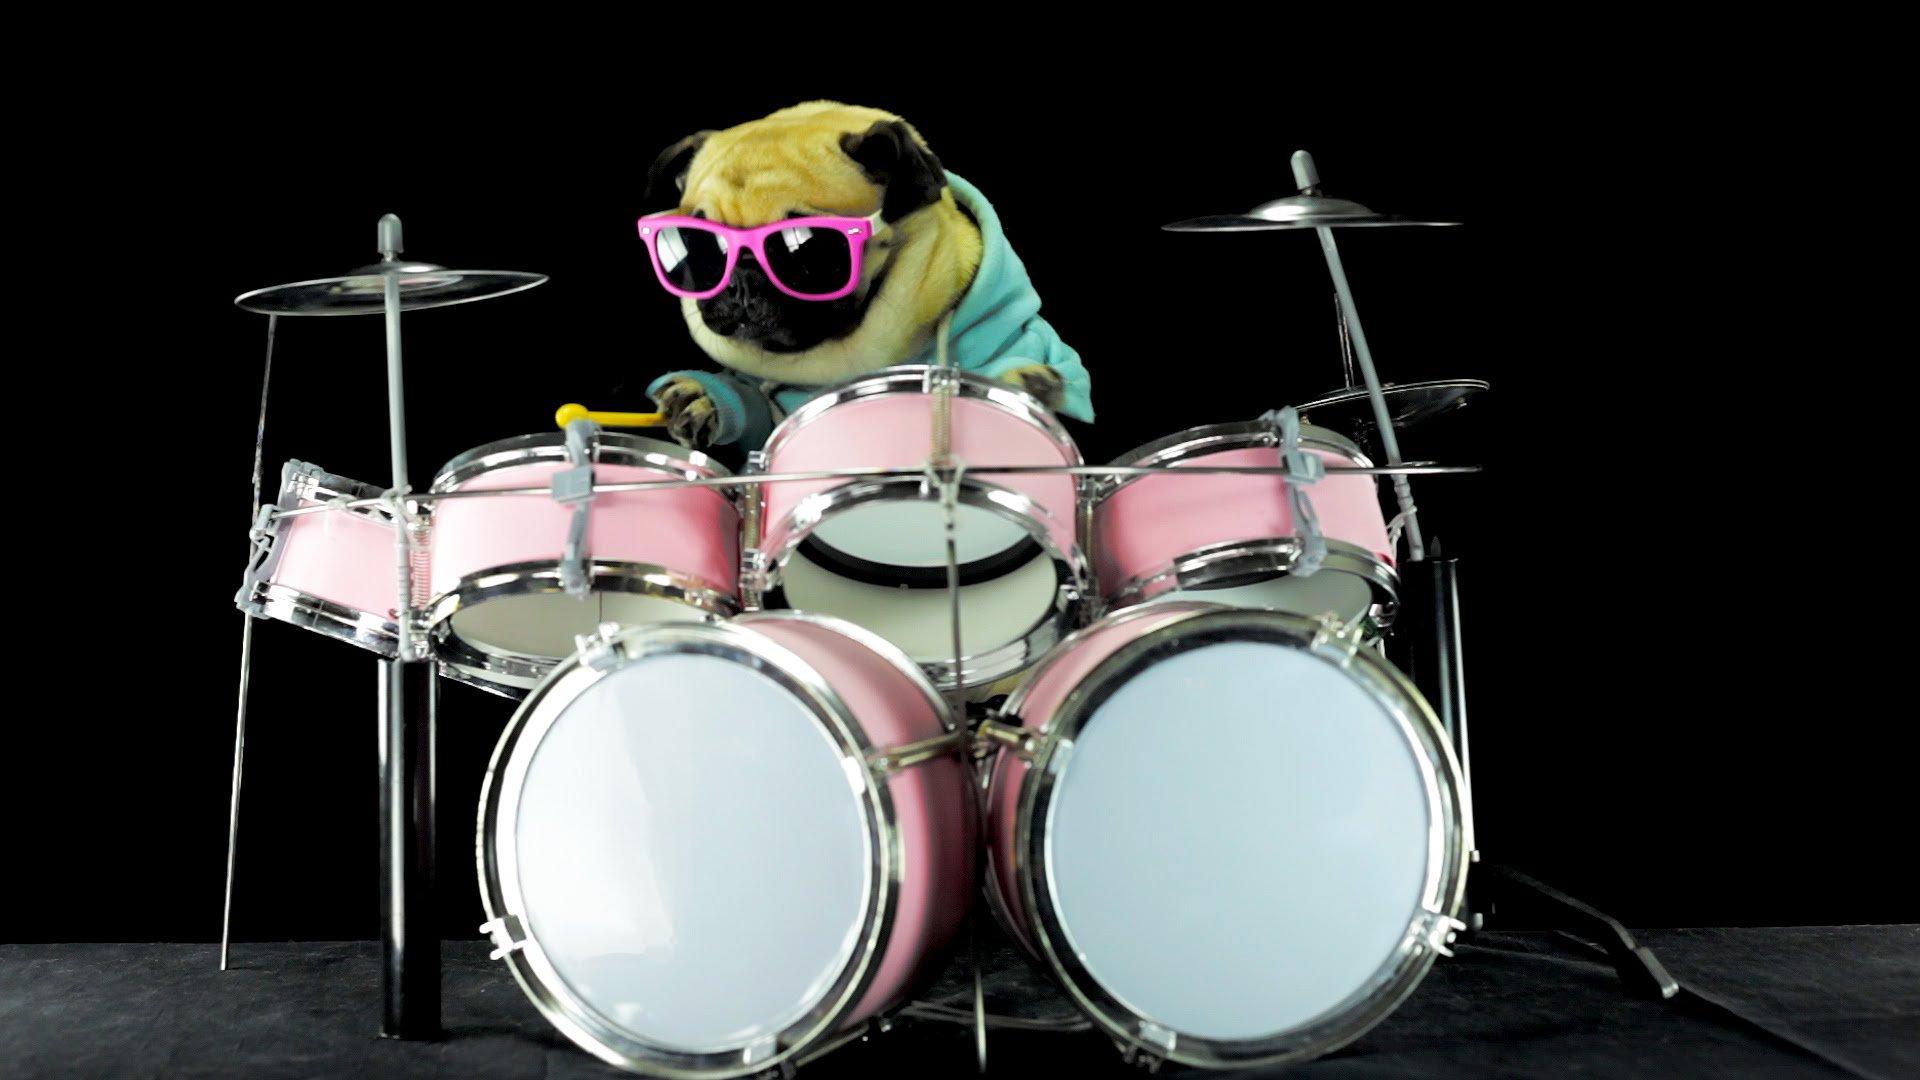 Thumbnail for DIYMC 5.10.17 - Drums, Baby!